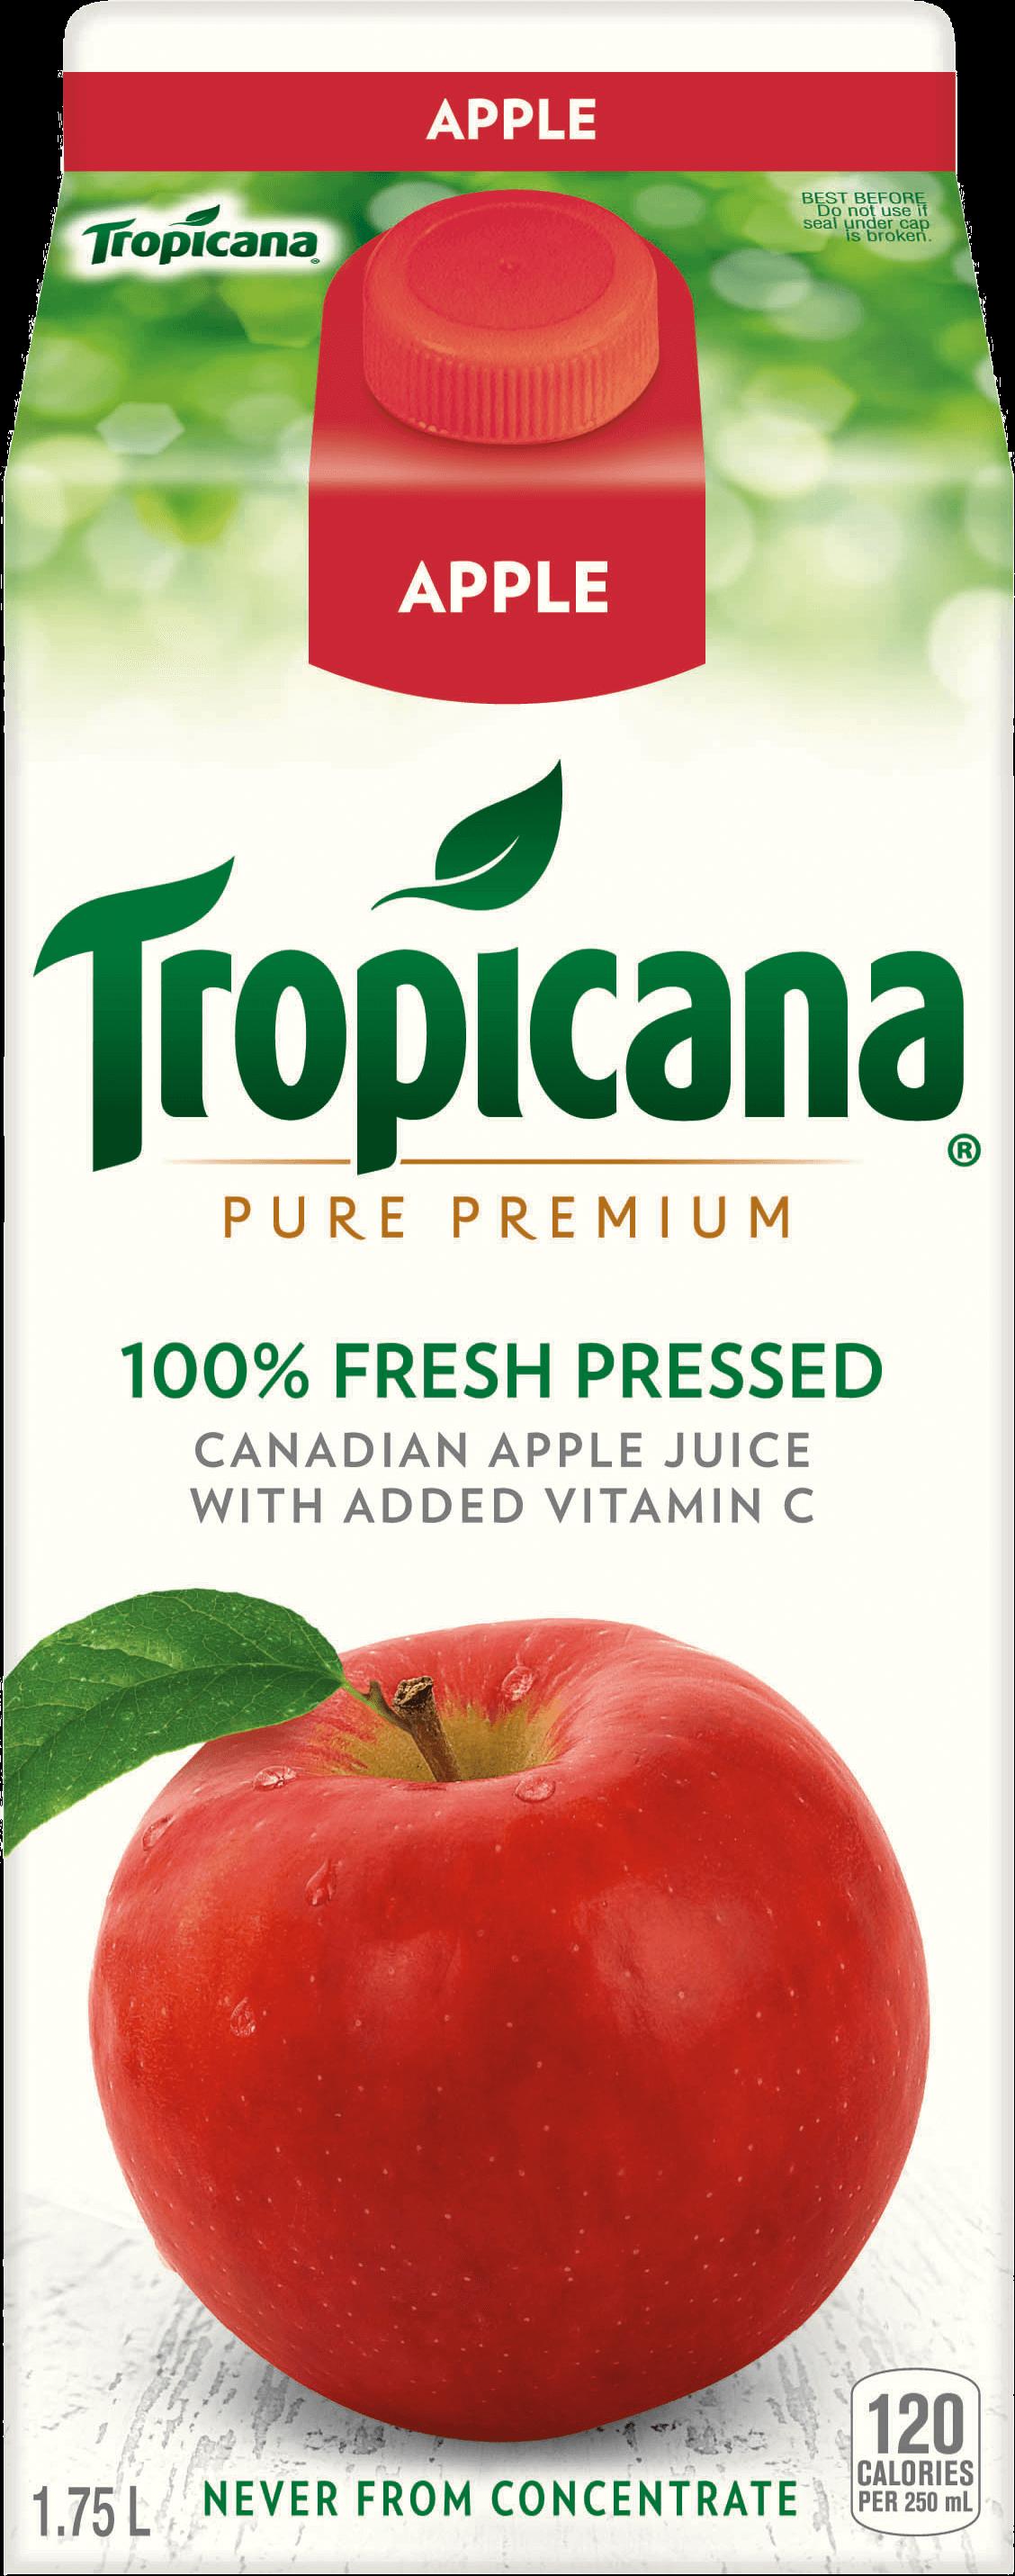 Tropicana® 100 % Fresh Pressed Apple Juice with Added Vitamin C